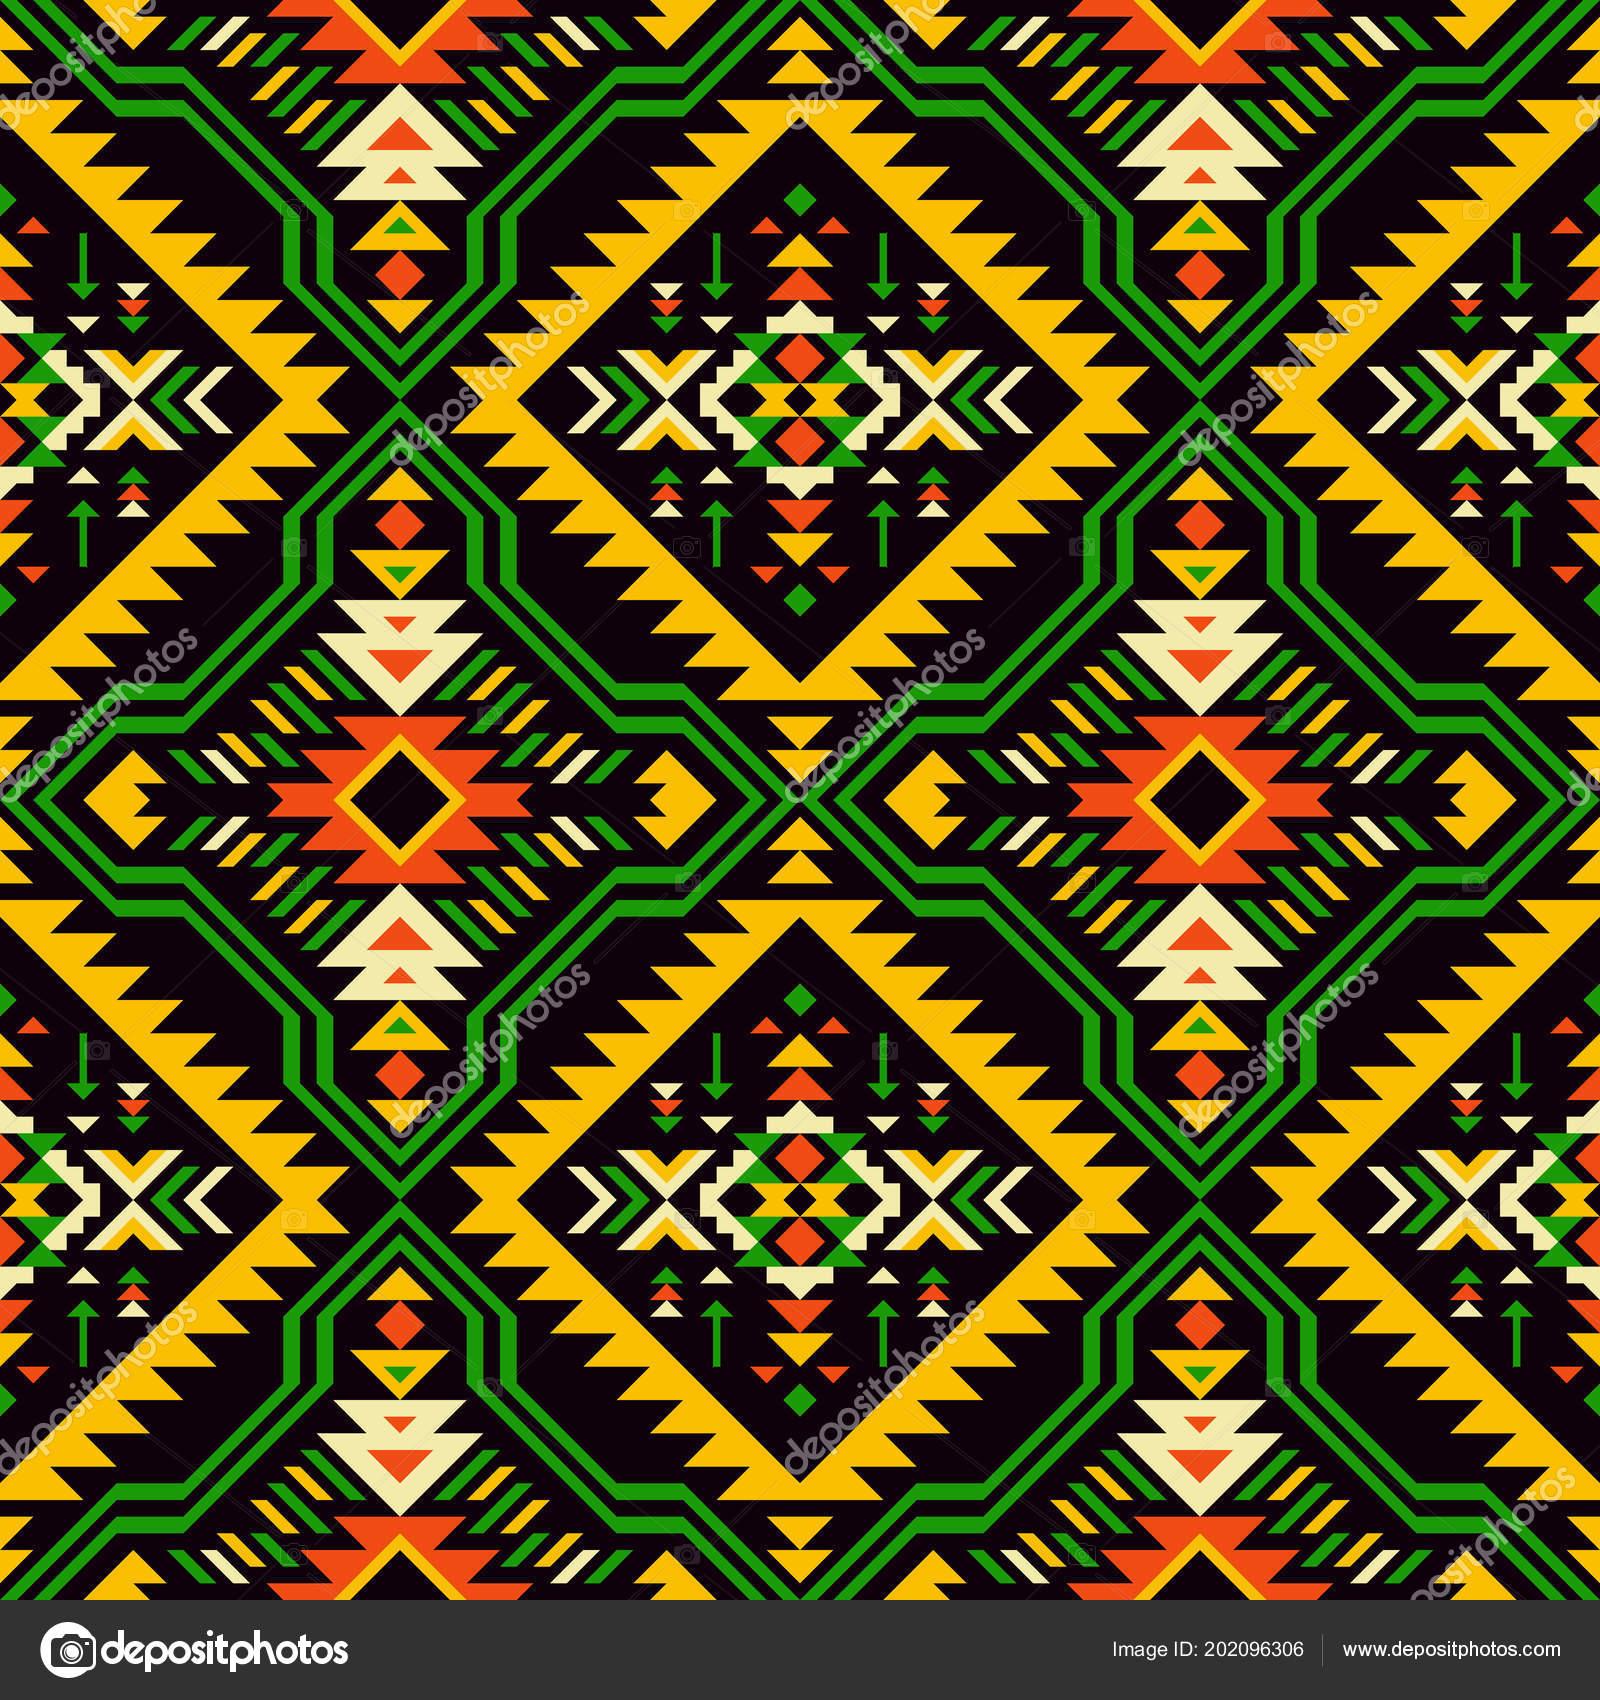 Native American Indian Design Fabric Aztec Geometric Seamless Pattern Native American Indian Southwest Print Ethnic Stock Vector C Pankratovaelena 202096306,Easy Simple Easy Small Rangoli Designs For Diwali